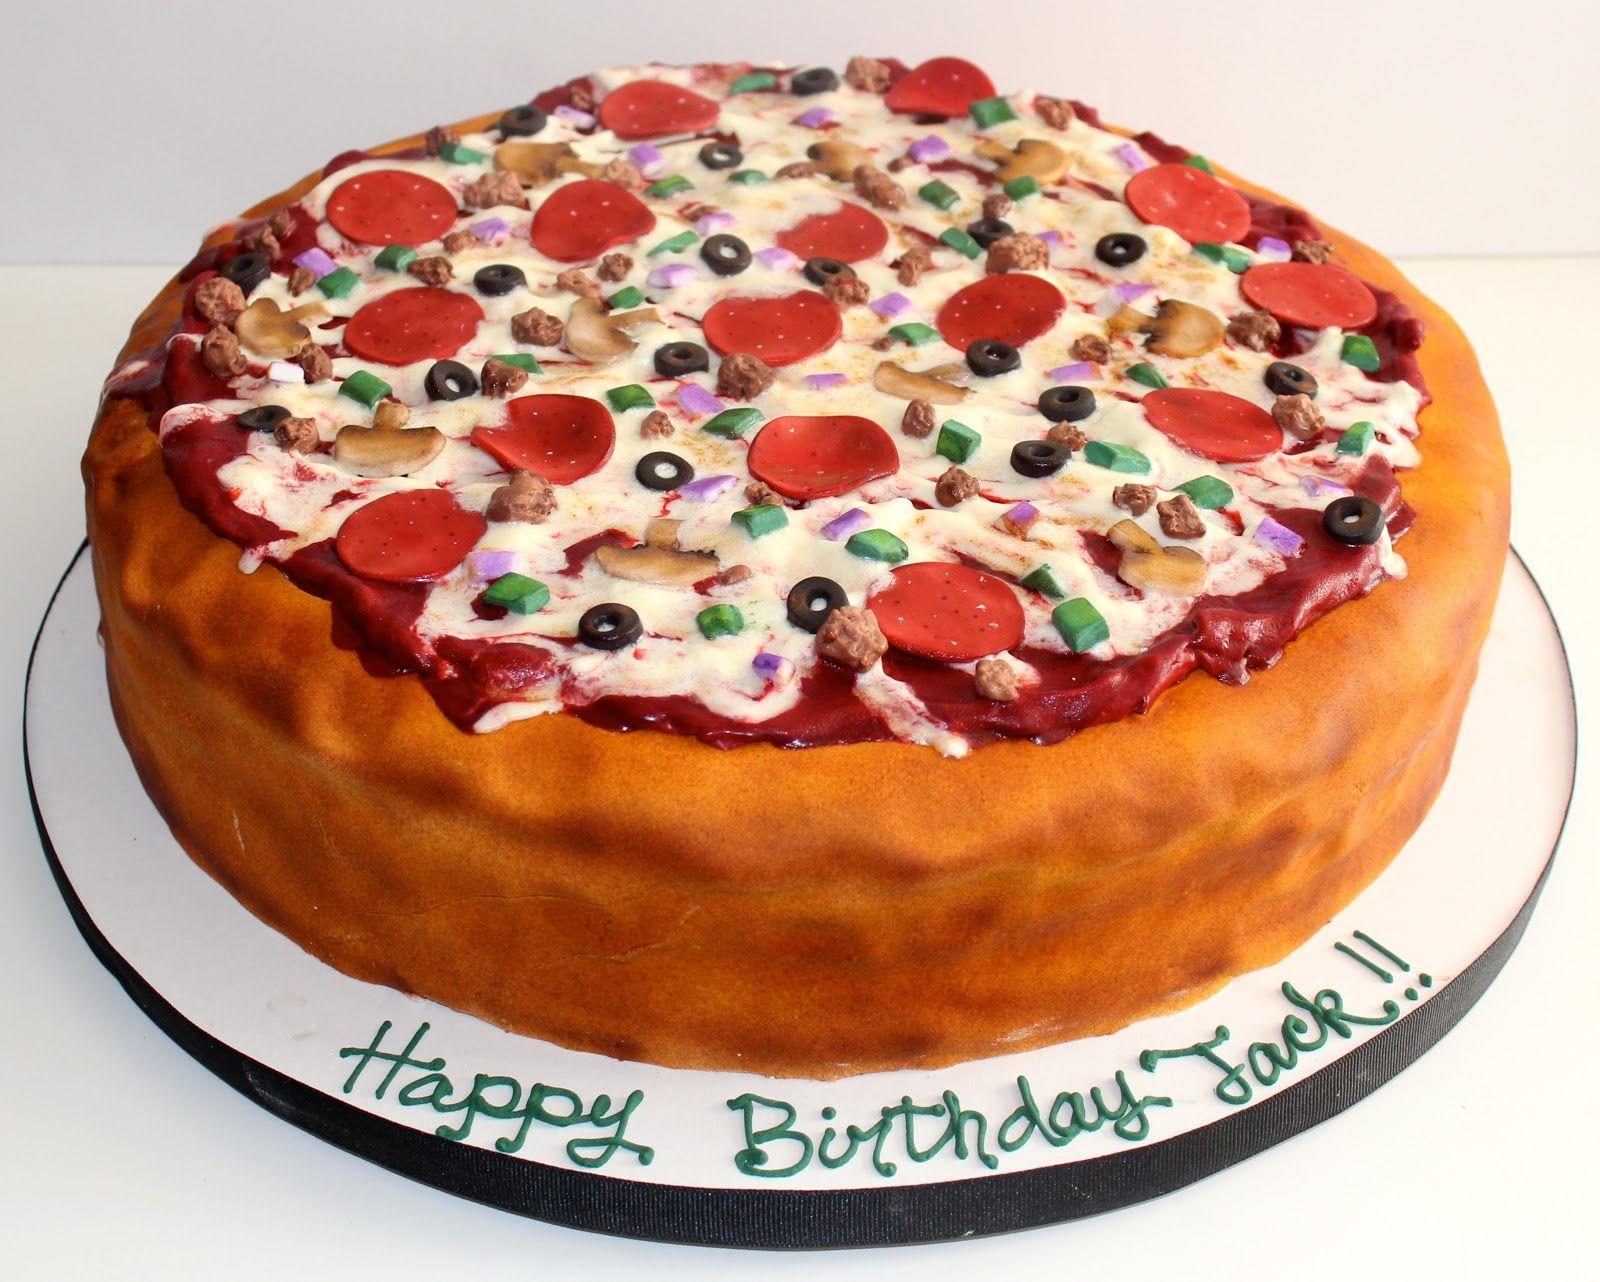 chocalate birthday cake pizza it tasted like yummy chocolate